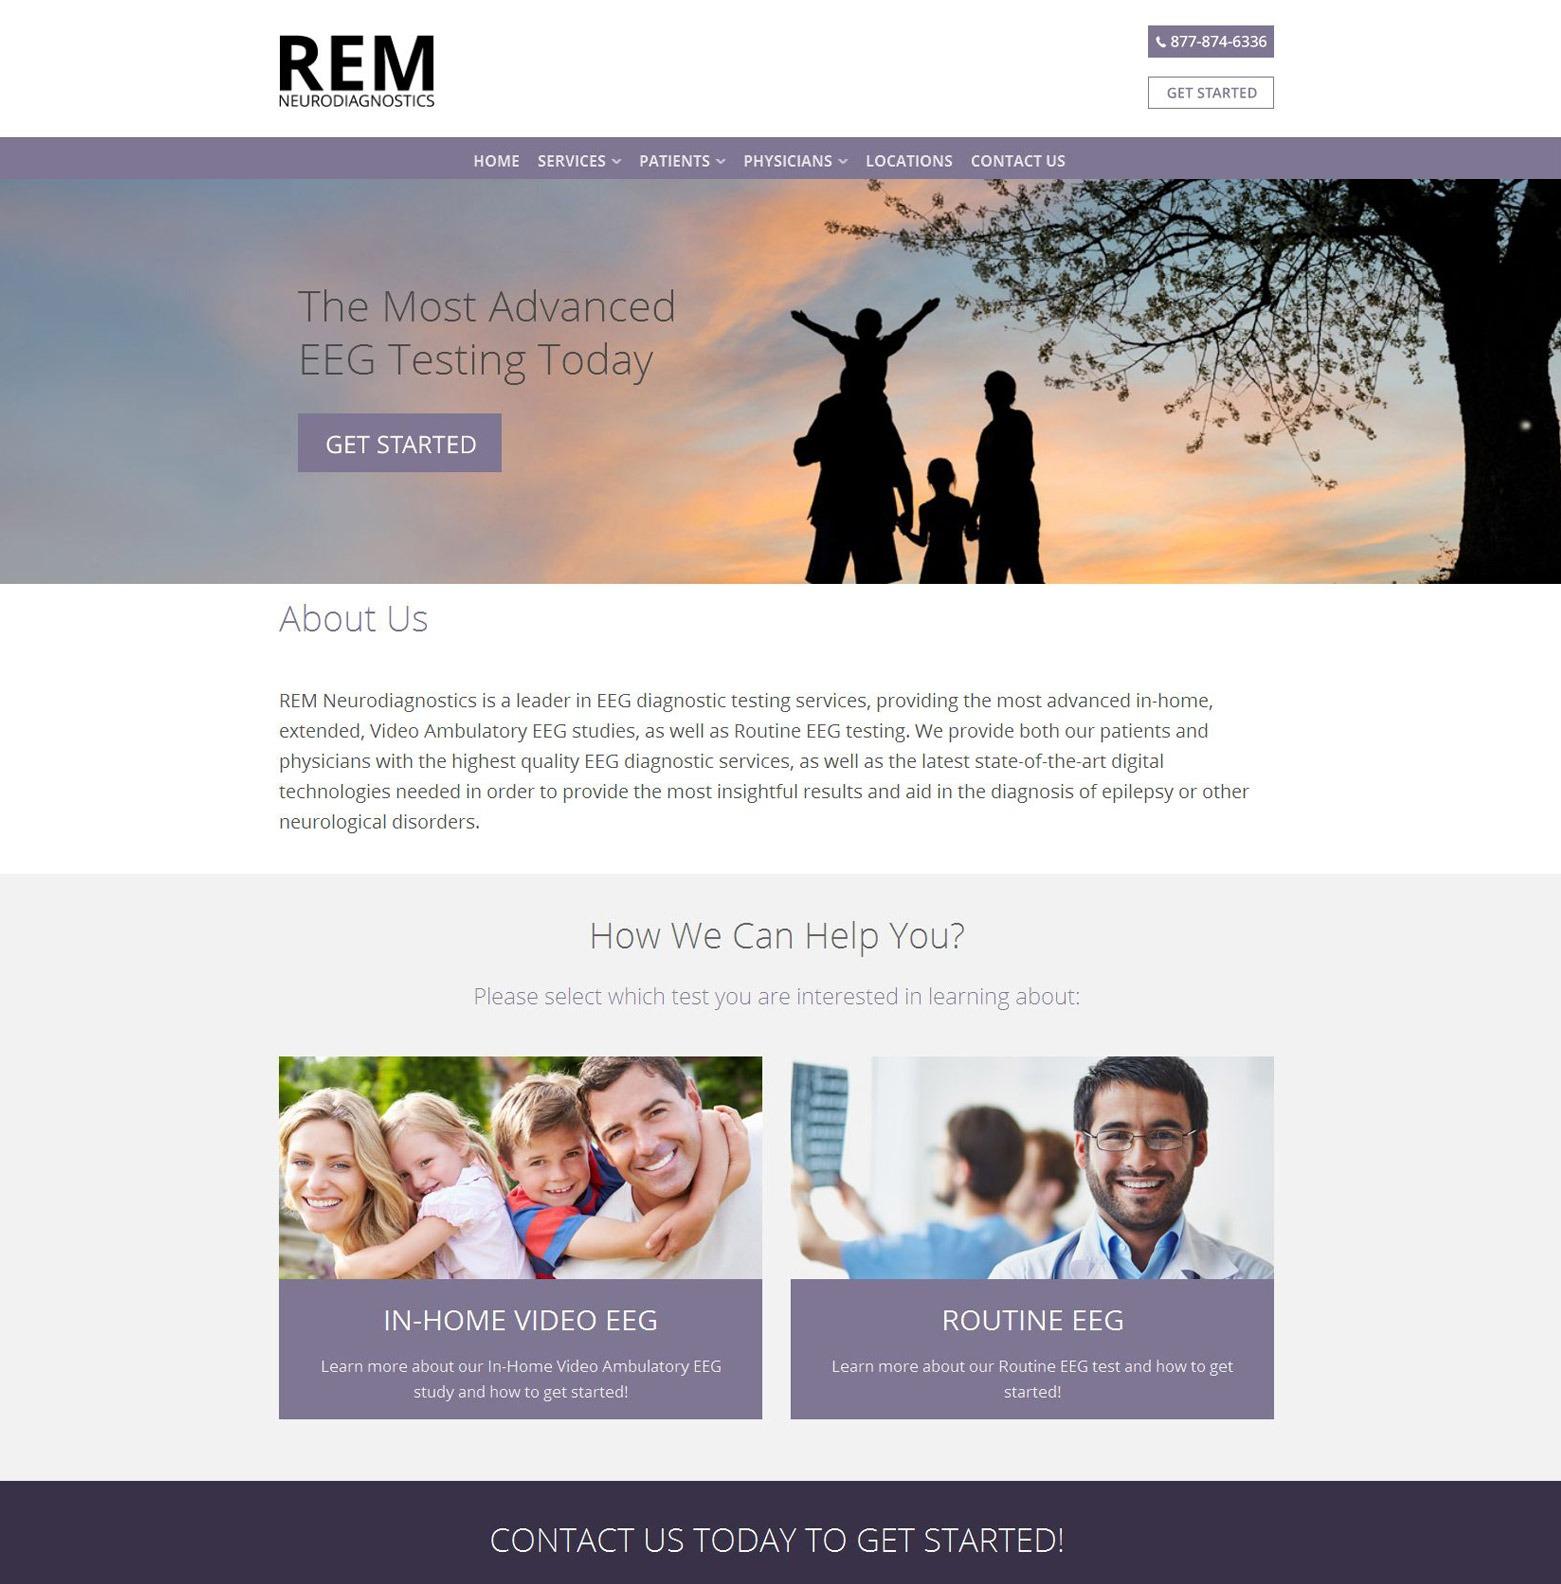 Los Angeles Medical Clinic Web Design Company